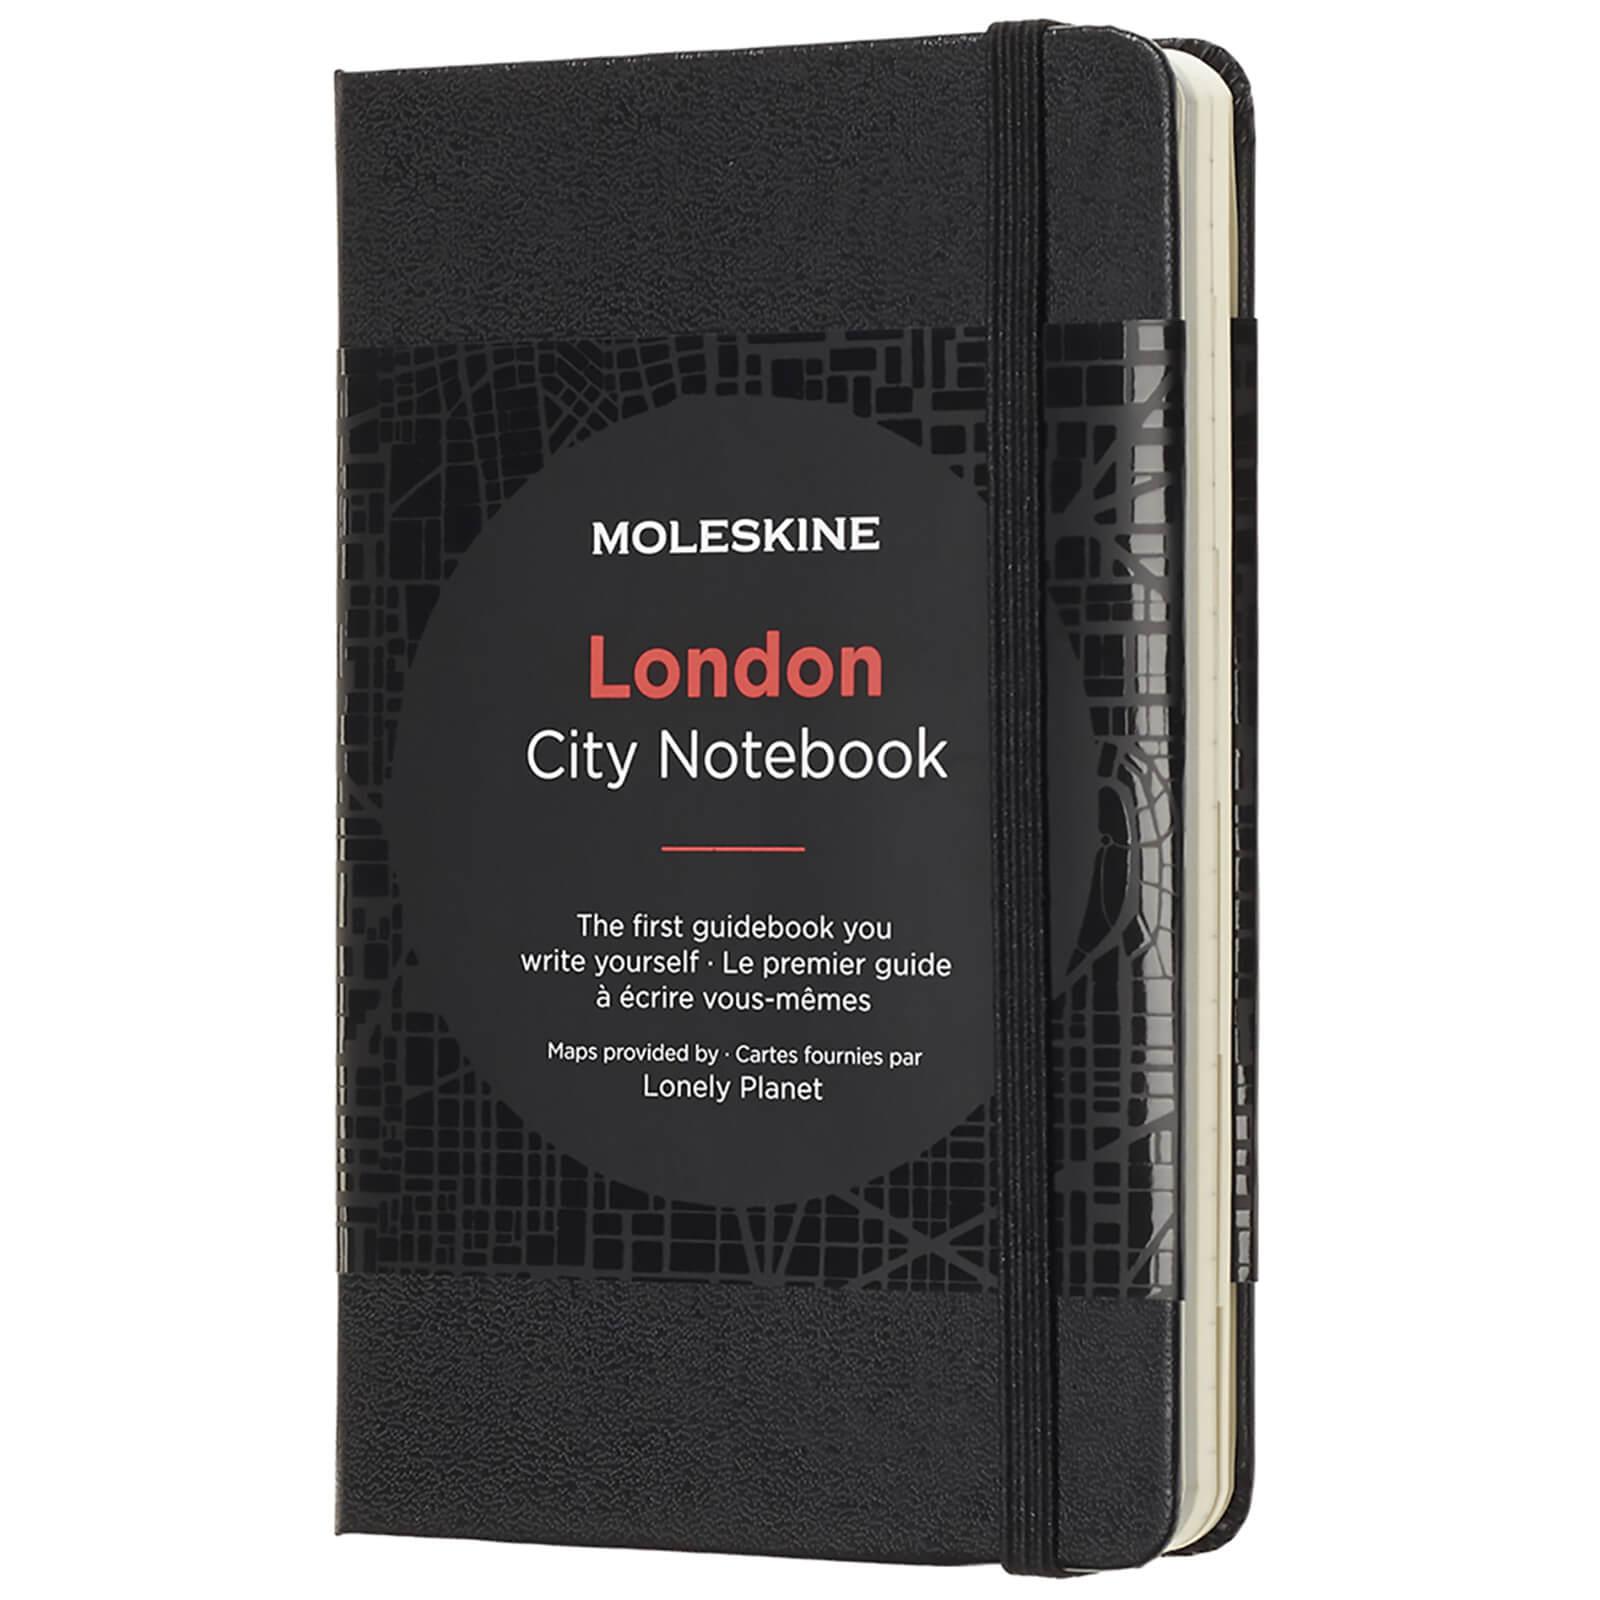 Moleskine City Notebook - London